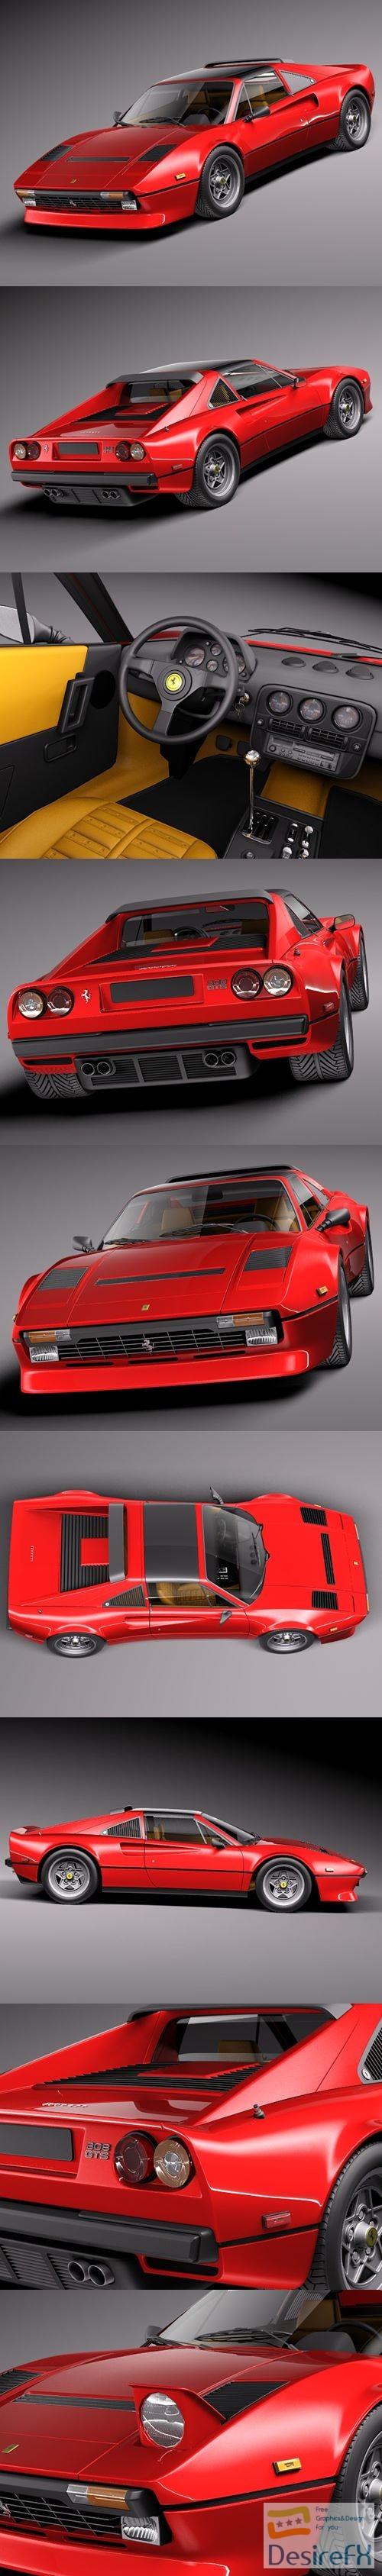 Ferrari 308 GTB GTS 1975-1984 3D Model